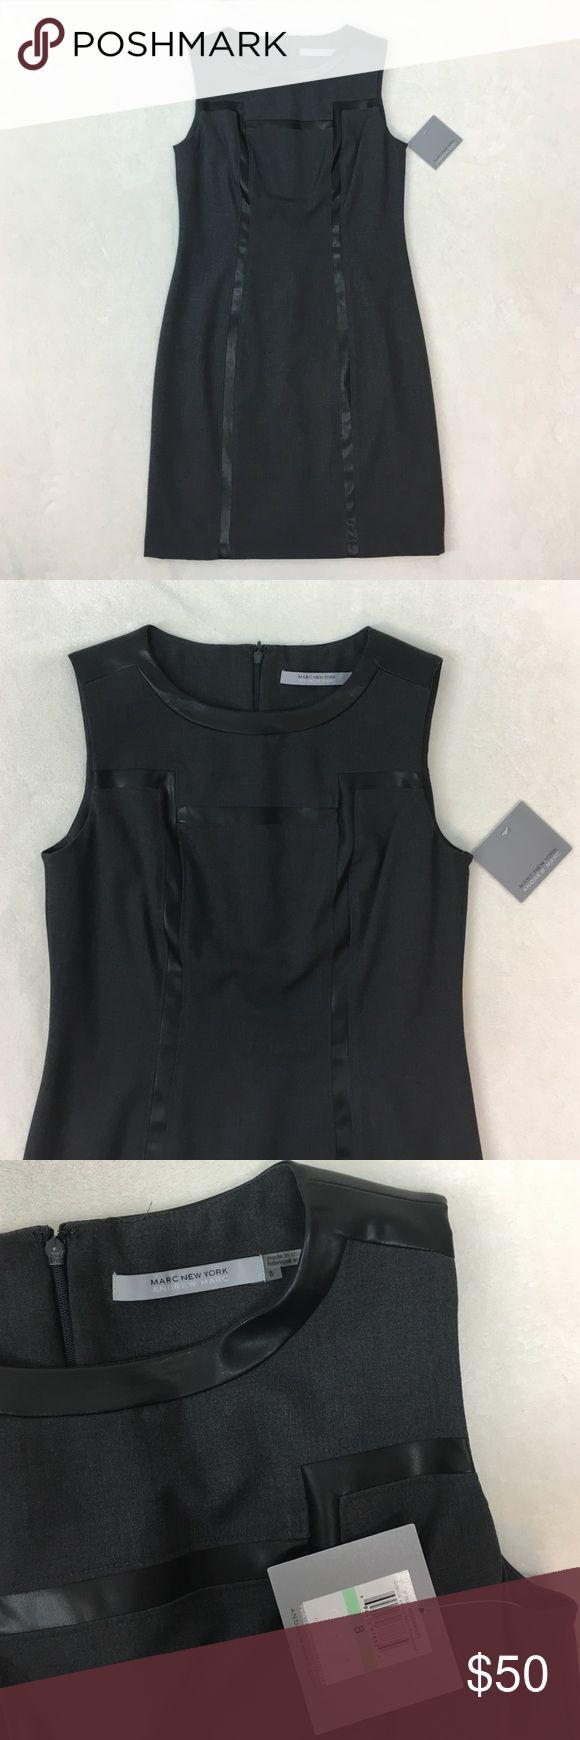 "NWT Andrew Marc New York Gray Sleeveless Dress 8 New with tags Marc New York Andrew Marc  Gray Dress  Womens Size 8 - bust measures 18"" across, 35.5"" long Andrew Marc Dresses Mini"